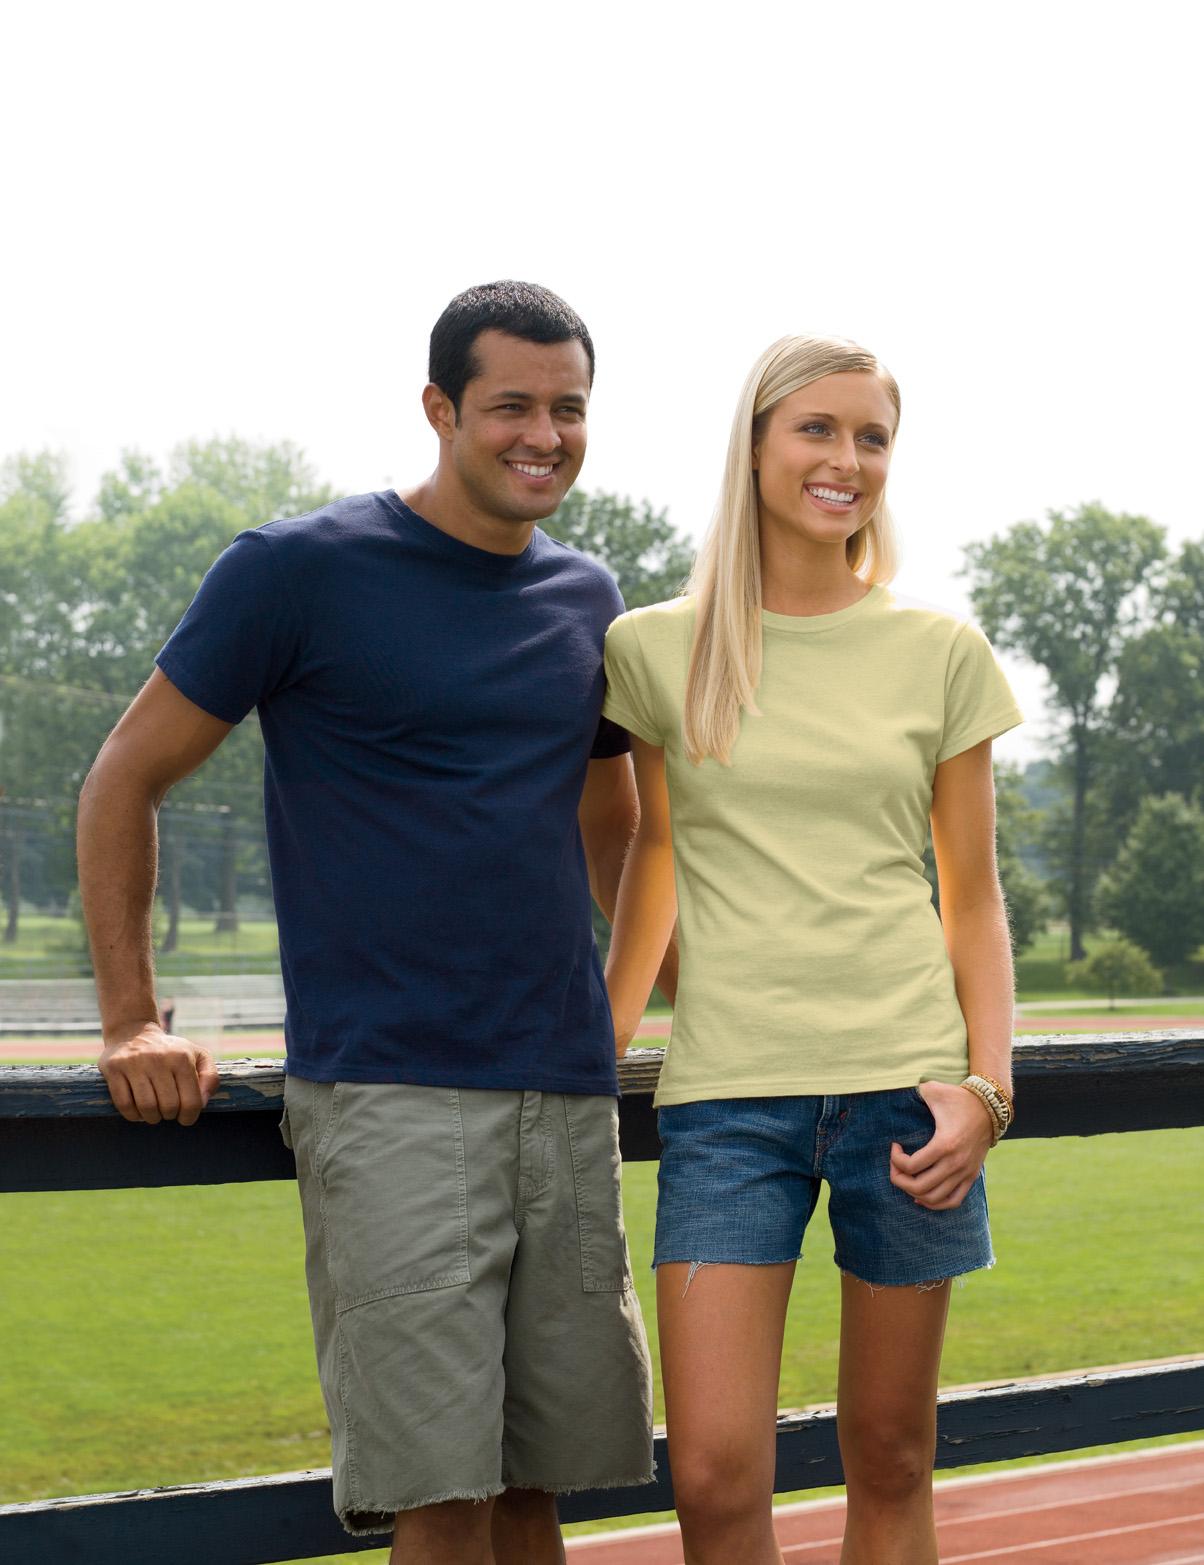 Gildan 64000 - Men's SoftStyle T-Shirt